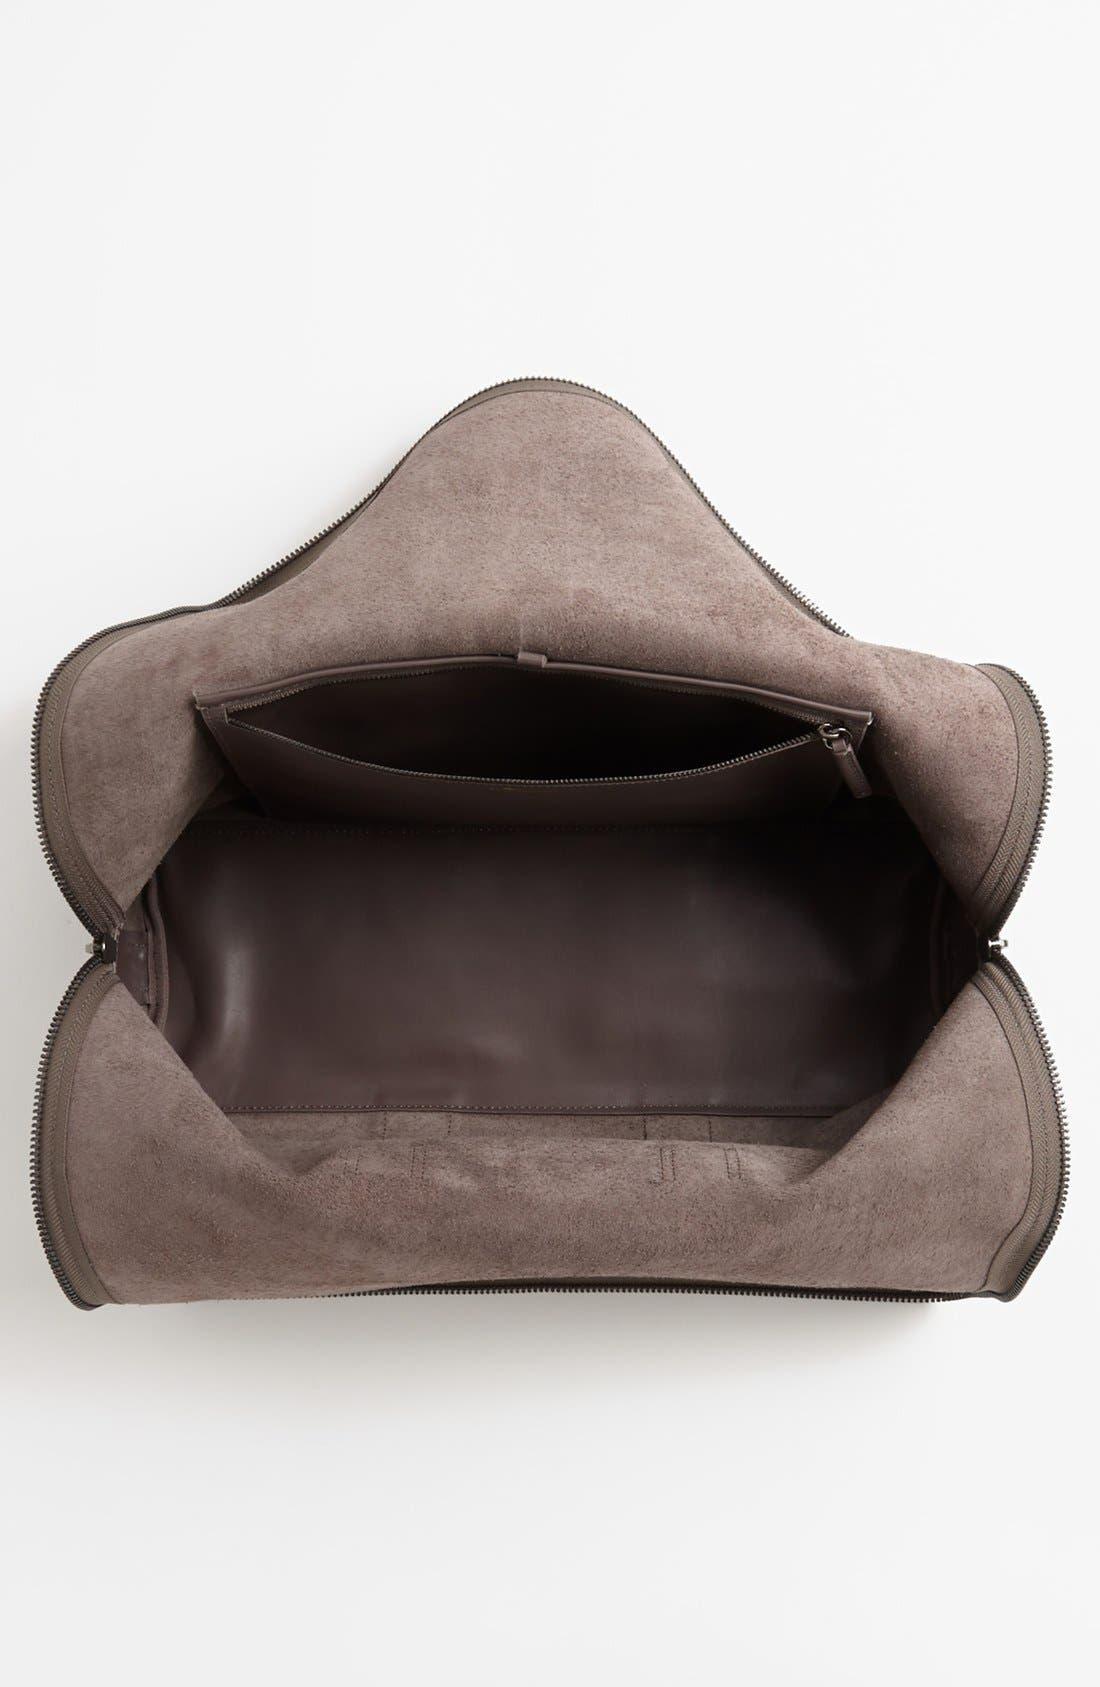 Alternate Image 3  - 3.1 Phillip Lim '31 Hour' Leather Tote